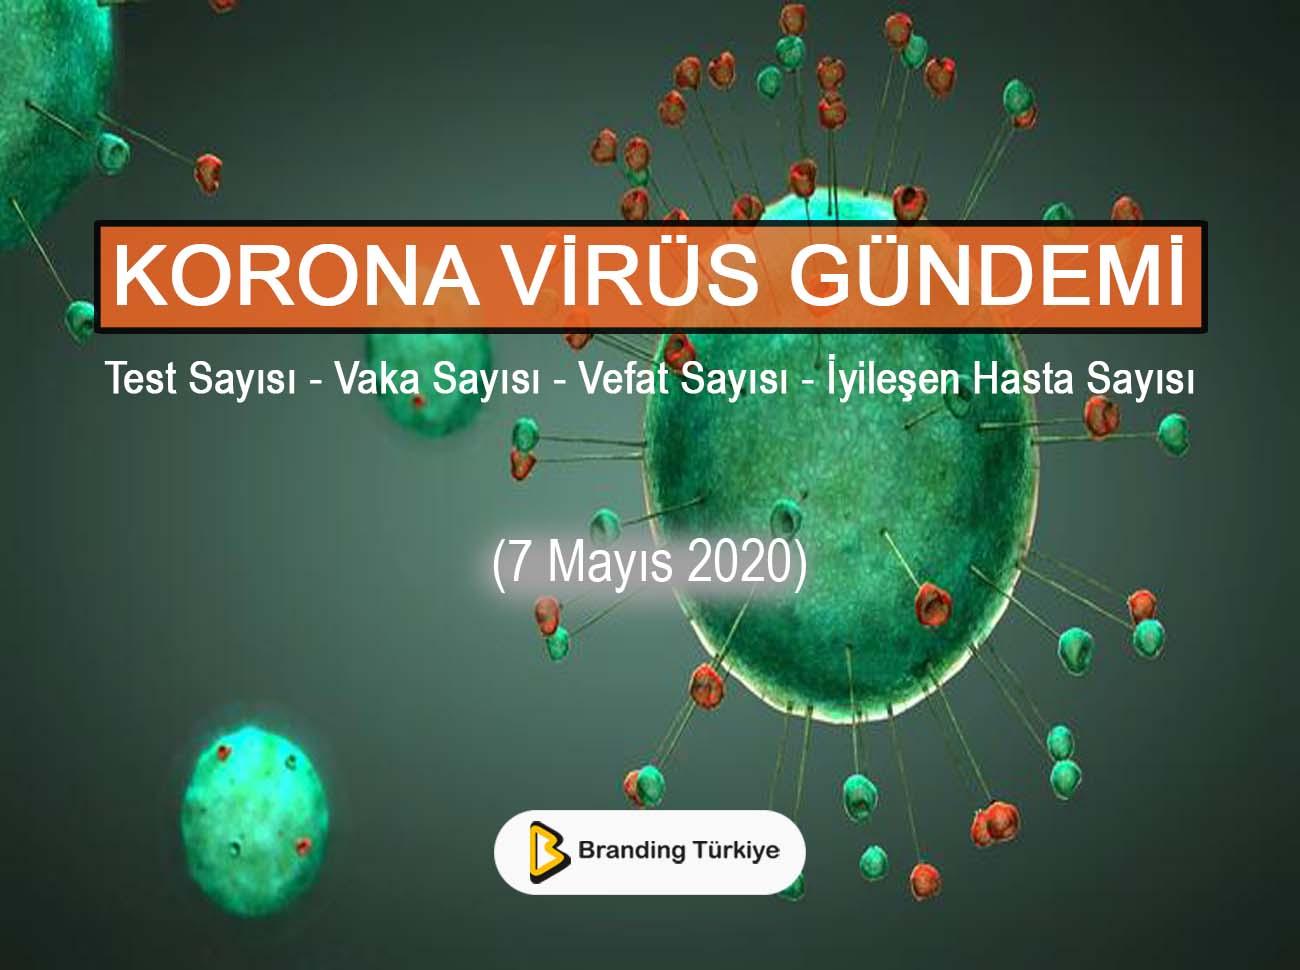 Korona Virüs Gündemi (7 Mayıs 2020)